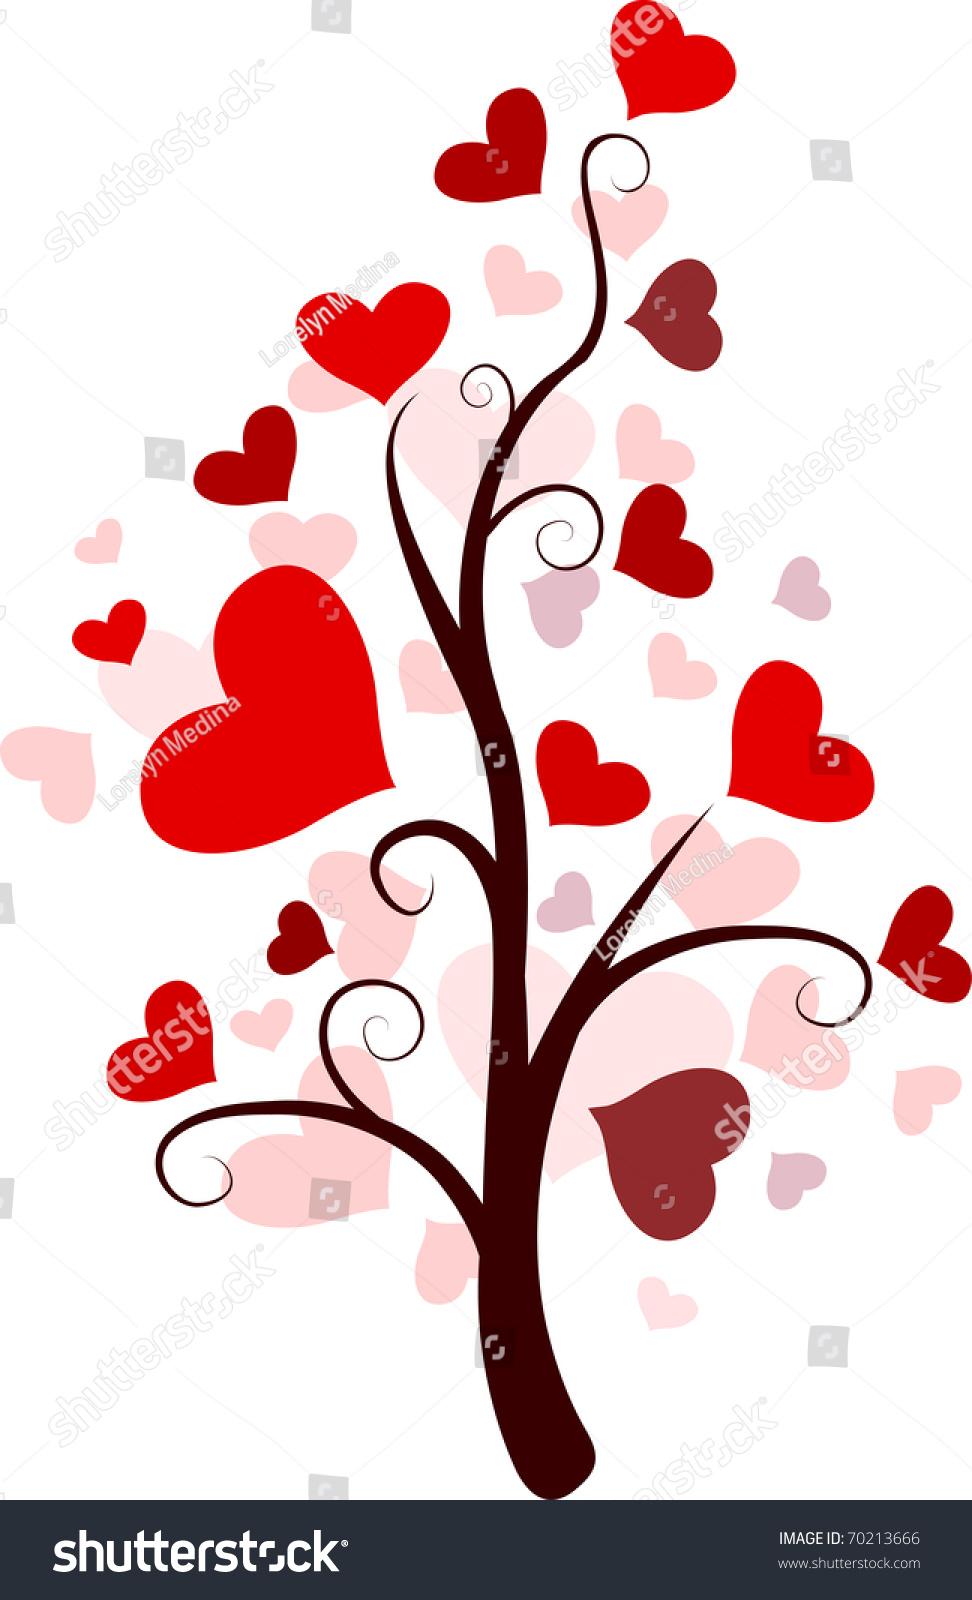 Illustration Random Tree Heartshaped Leaves Stock Vector Royalty